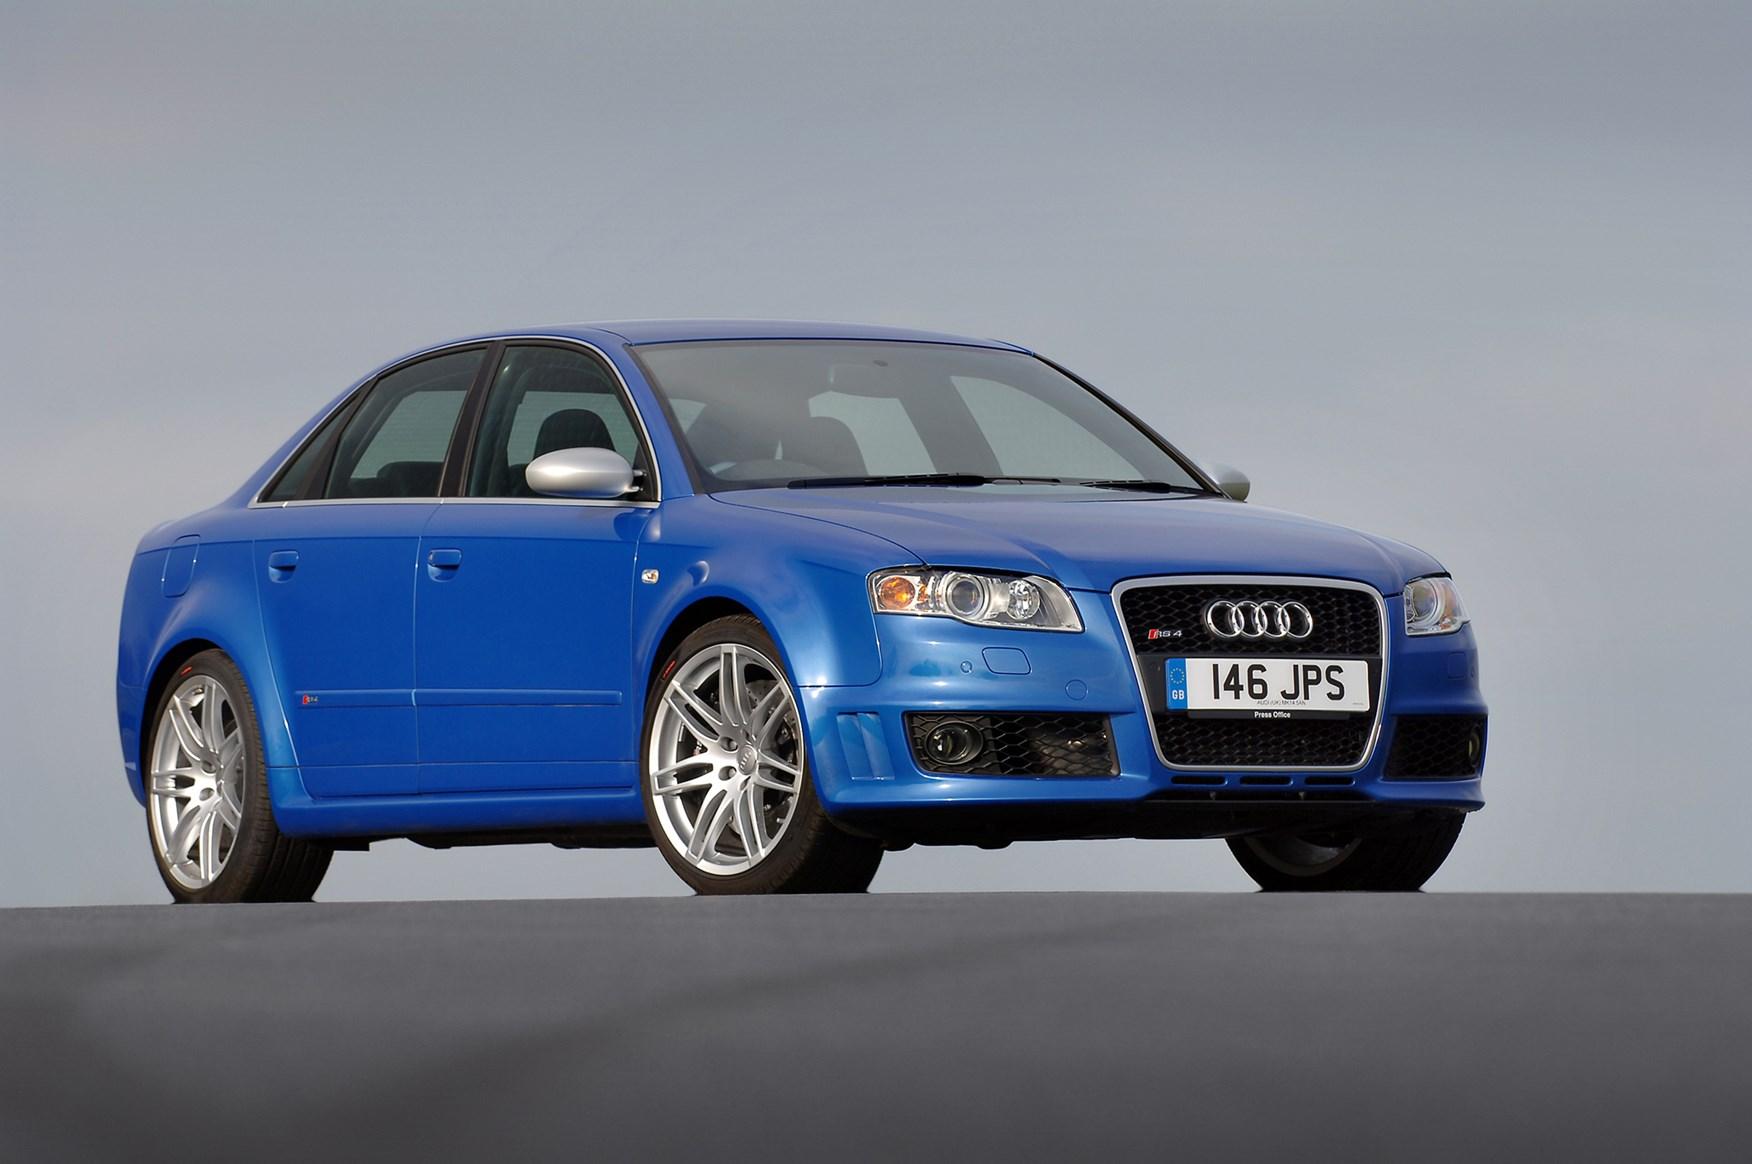 Audi A4 RS4 Review (2005 - 2008) | Parkers